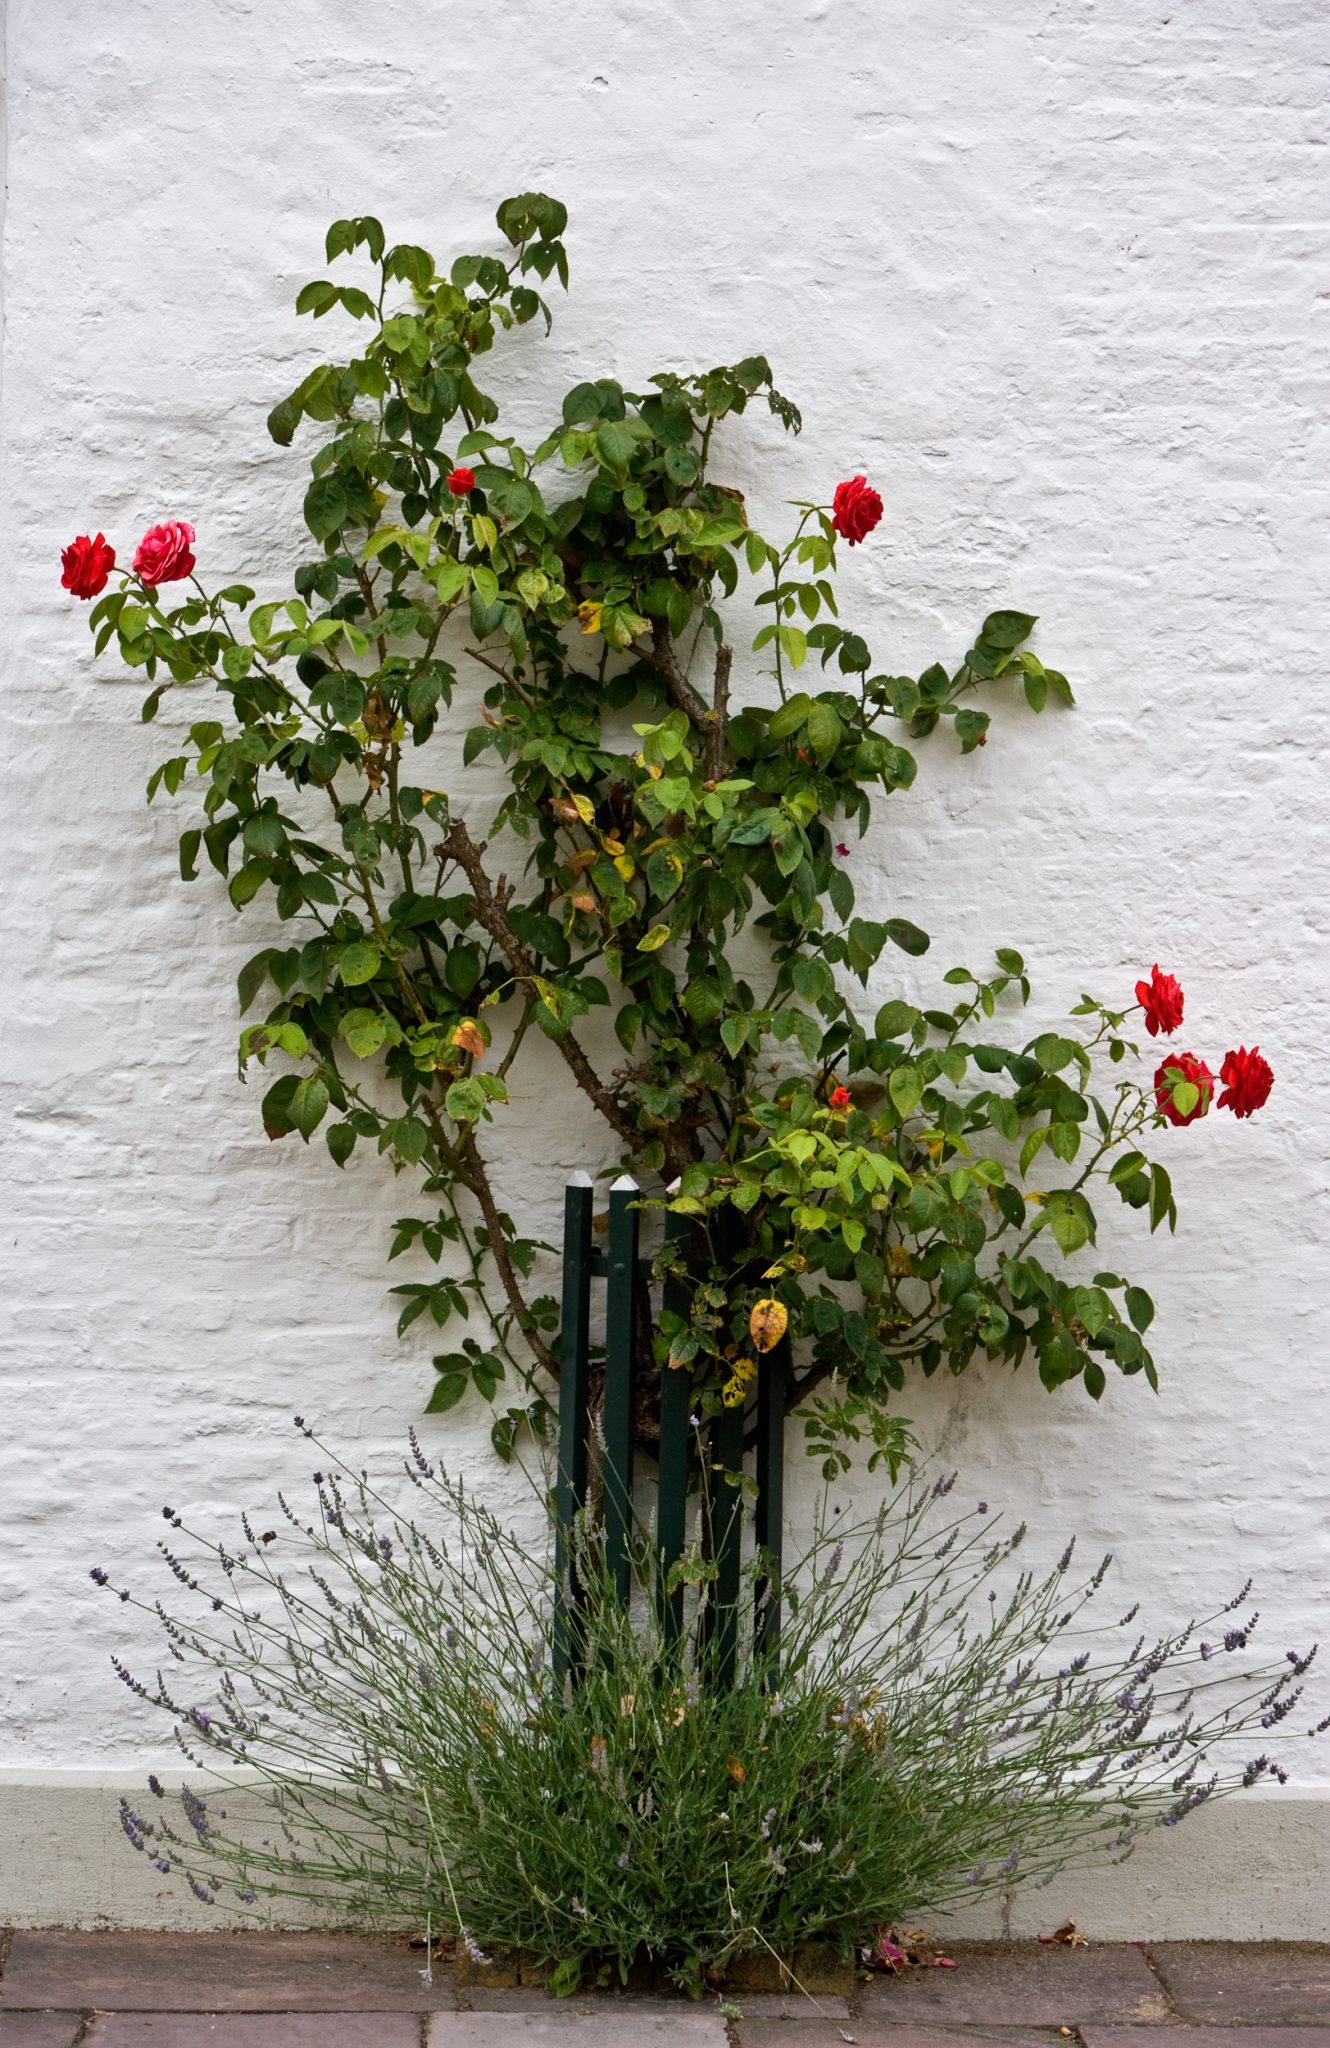 Roses on white wall - Friedrichstadt Germany